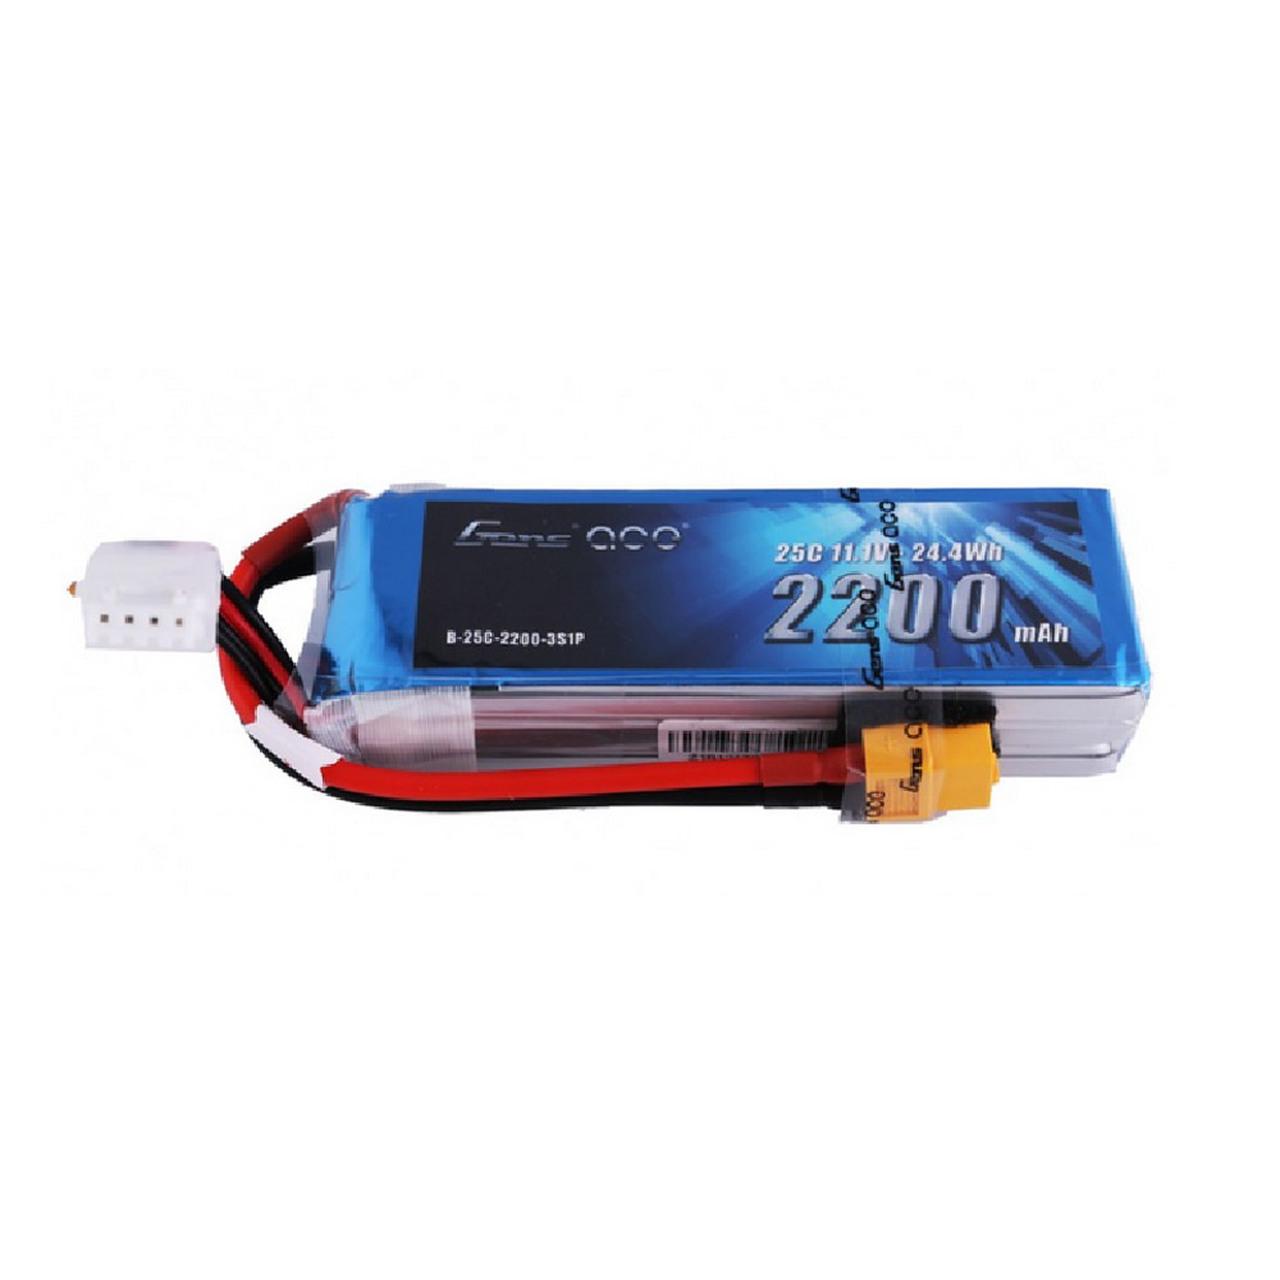 Gens ace 25C 2200mah 11.1V 3S Lipo Battery Pack with XT60 Plug